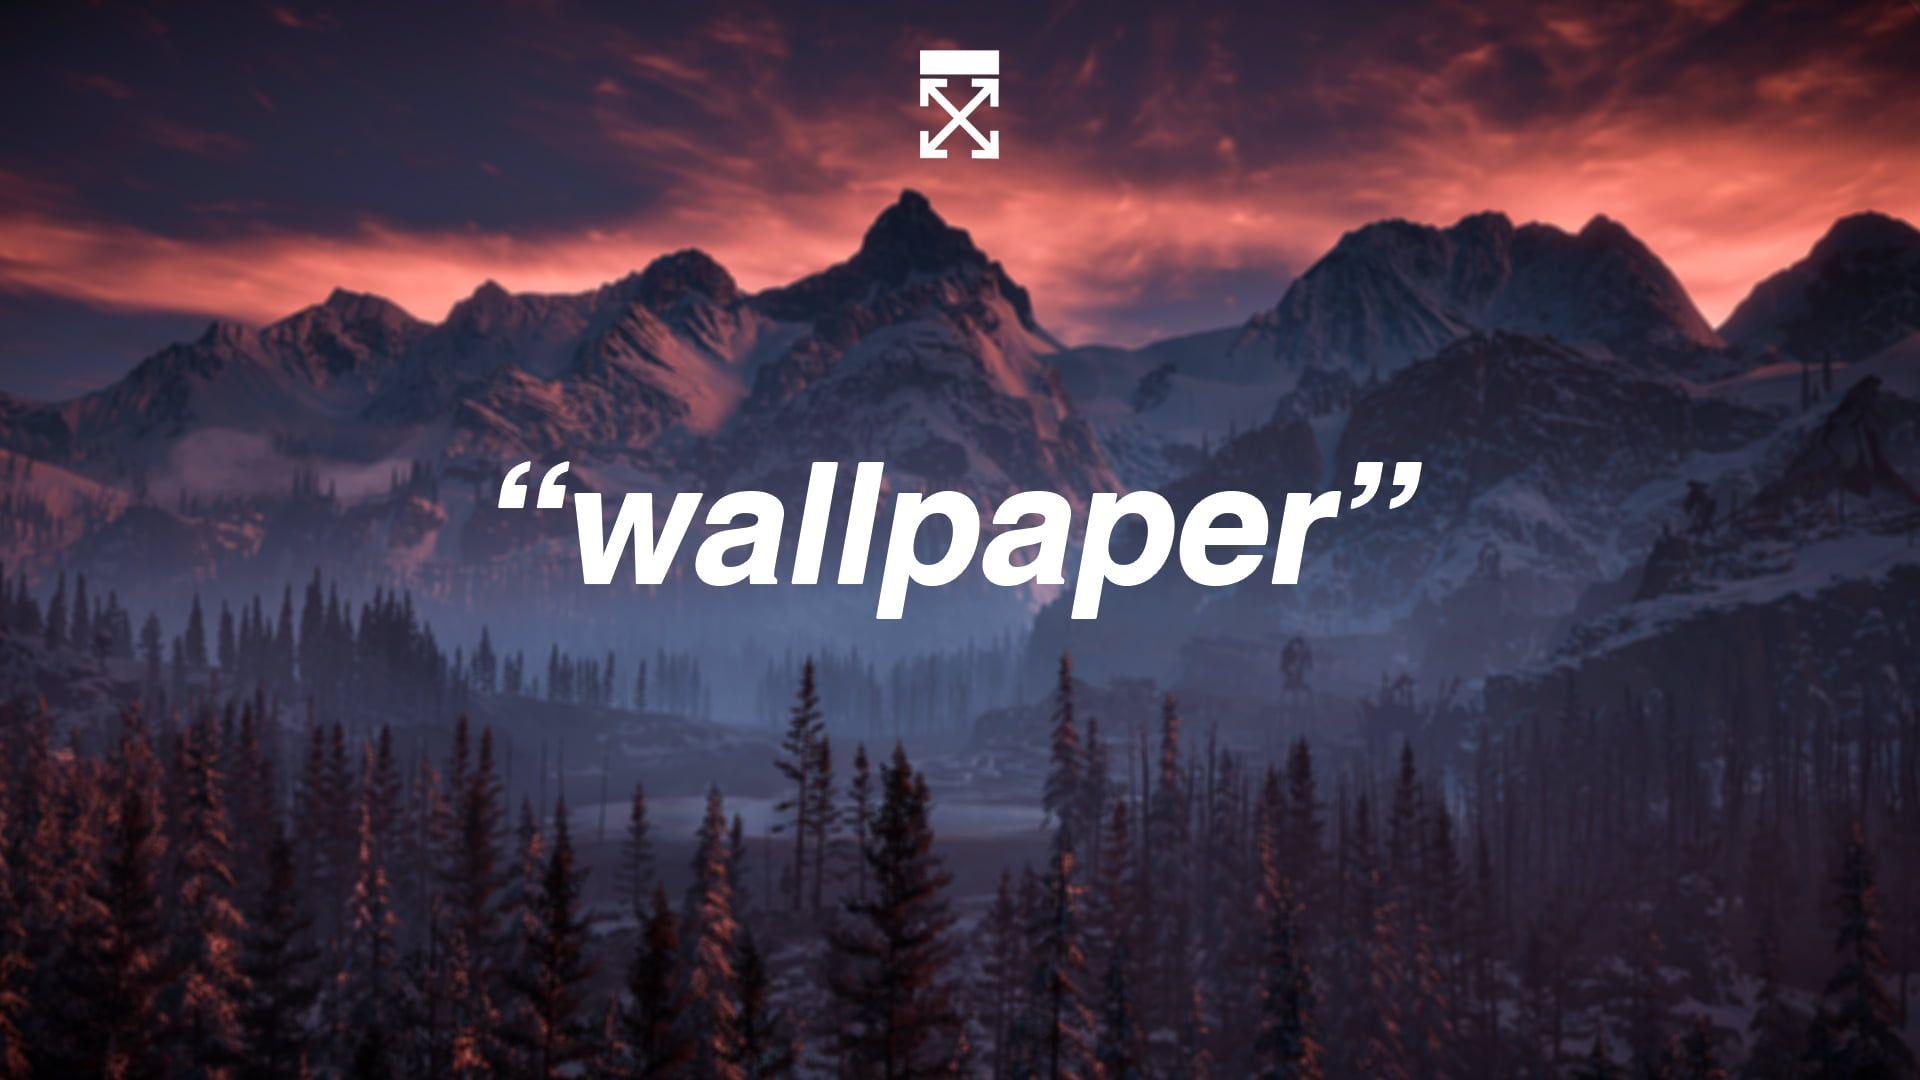 Off White Minimalism Mountains 1080p Wallpaper Hdwallpaper Desktop Wallpaper Off White Wallpaper Mountains Wallpaper